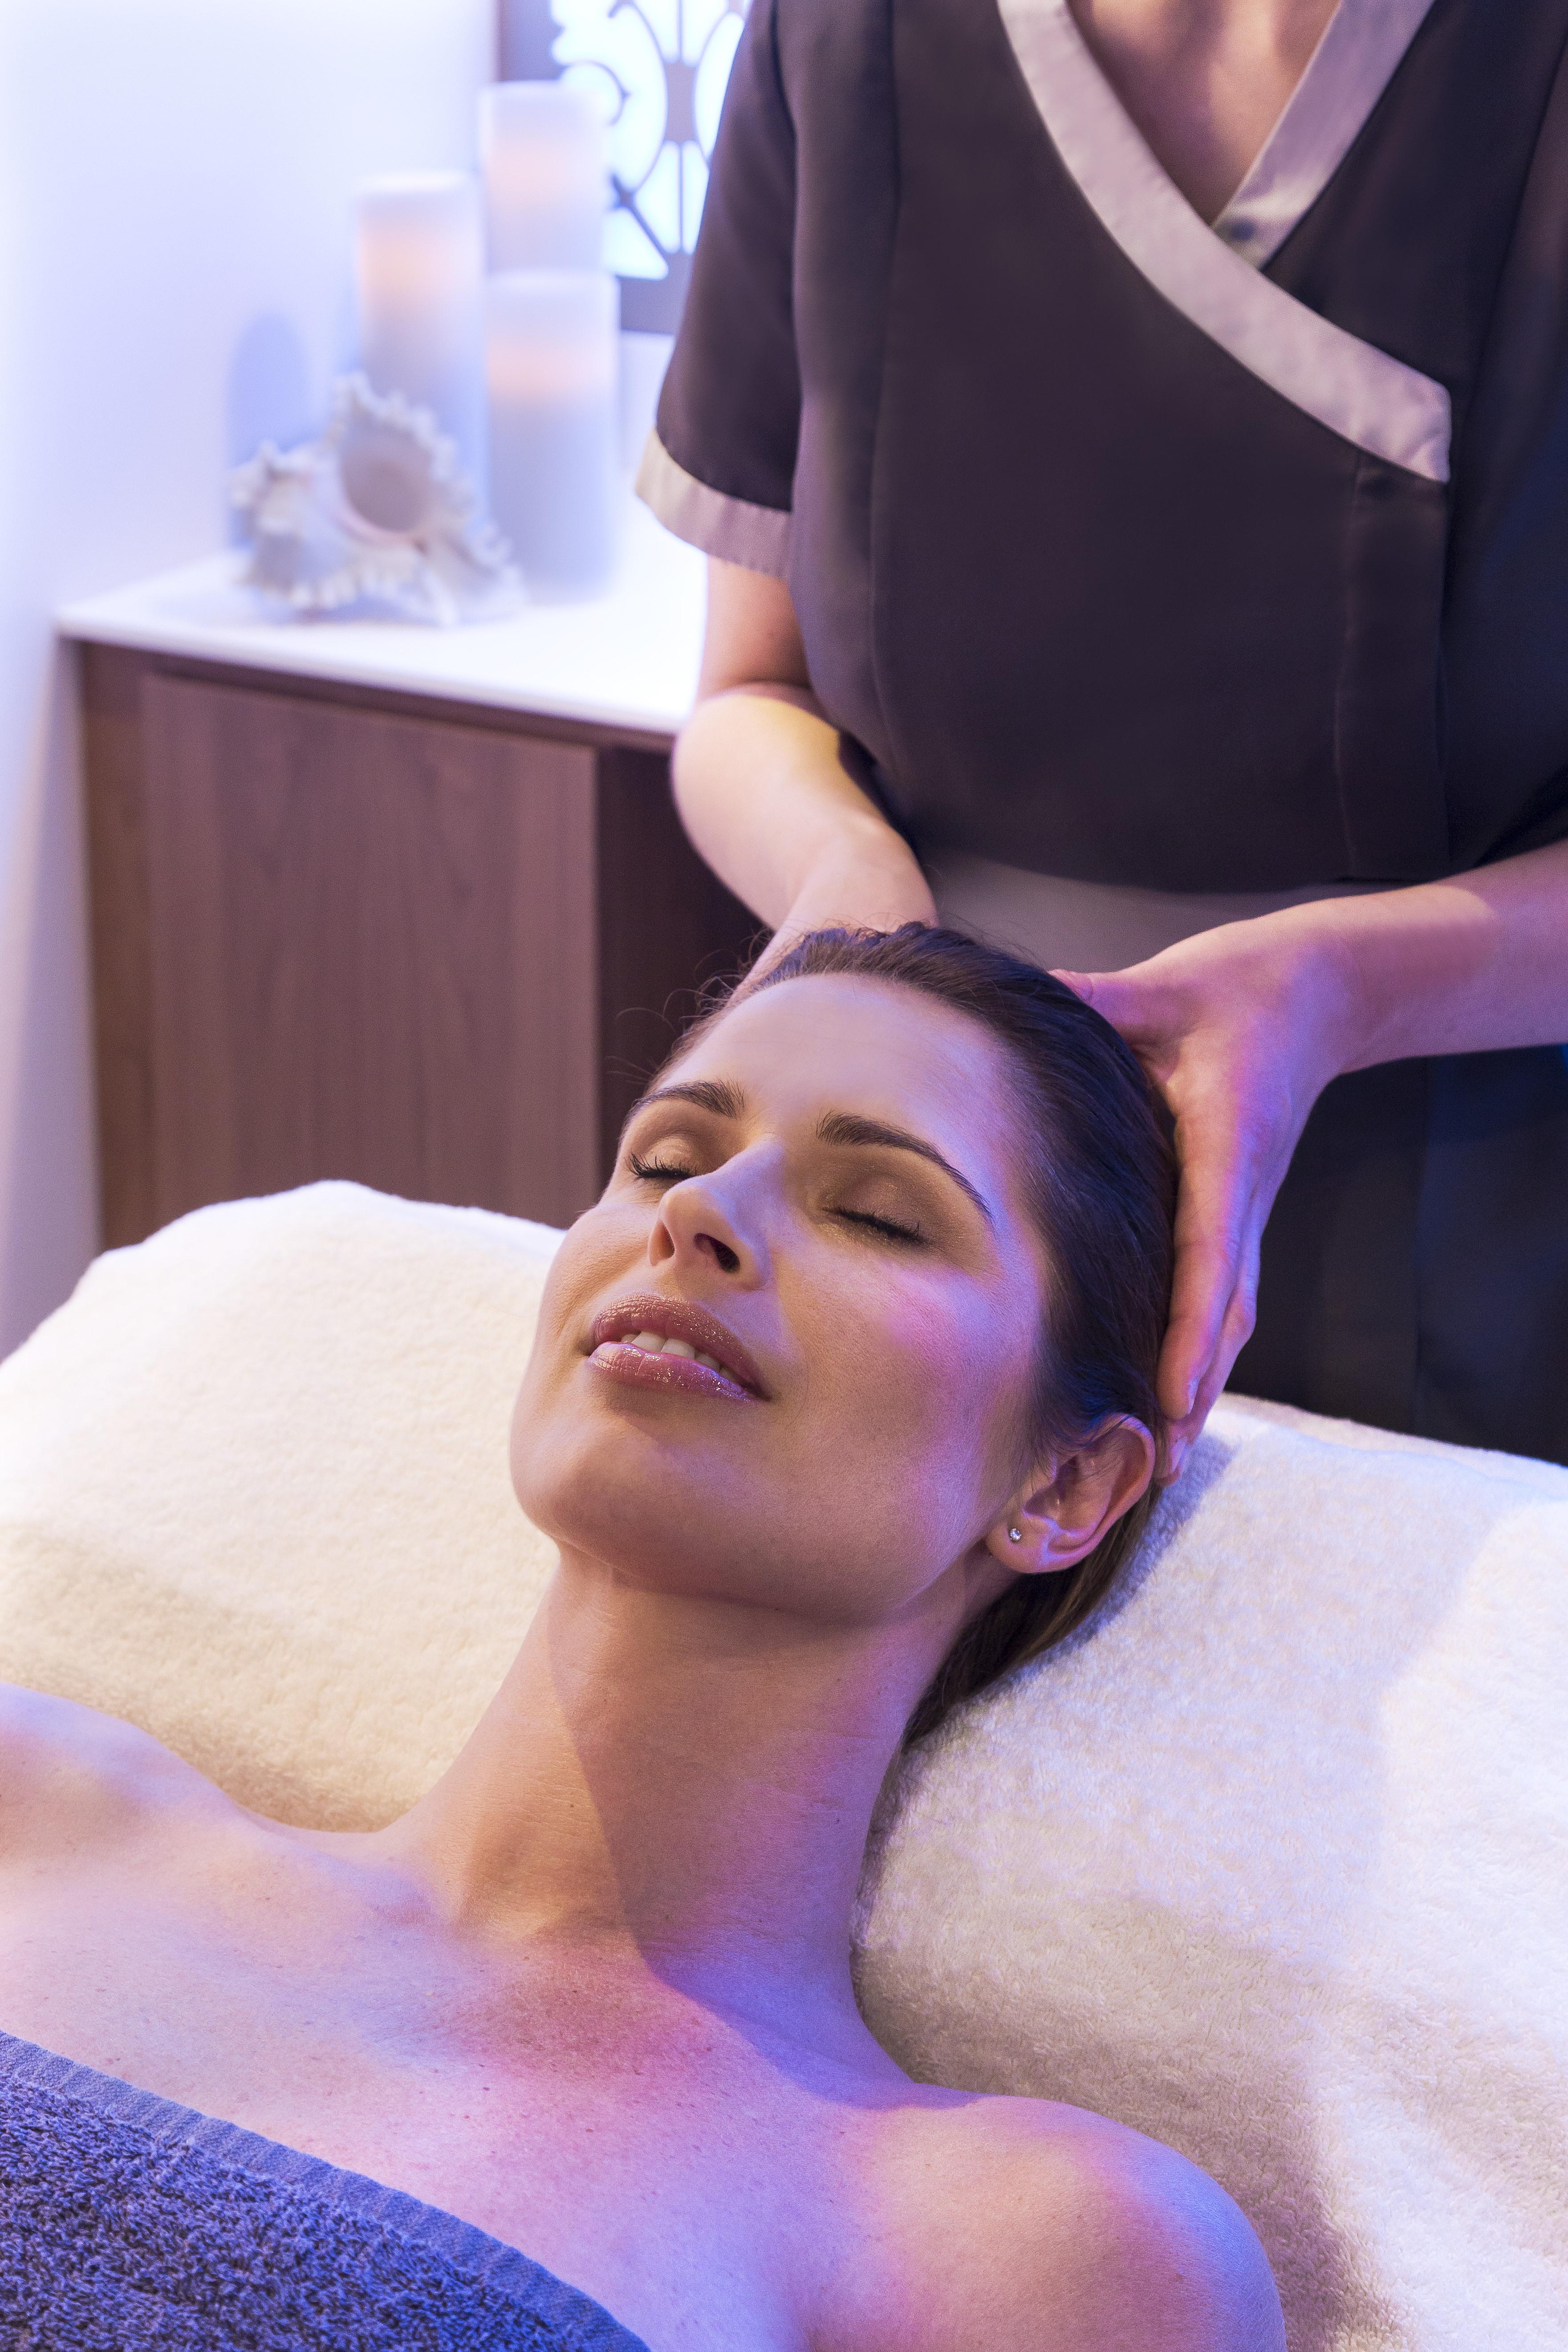 Les délices du massage ©Fabrice Rambert